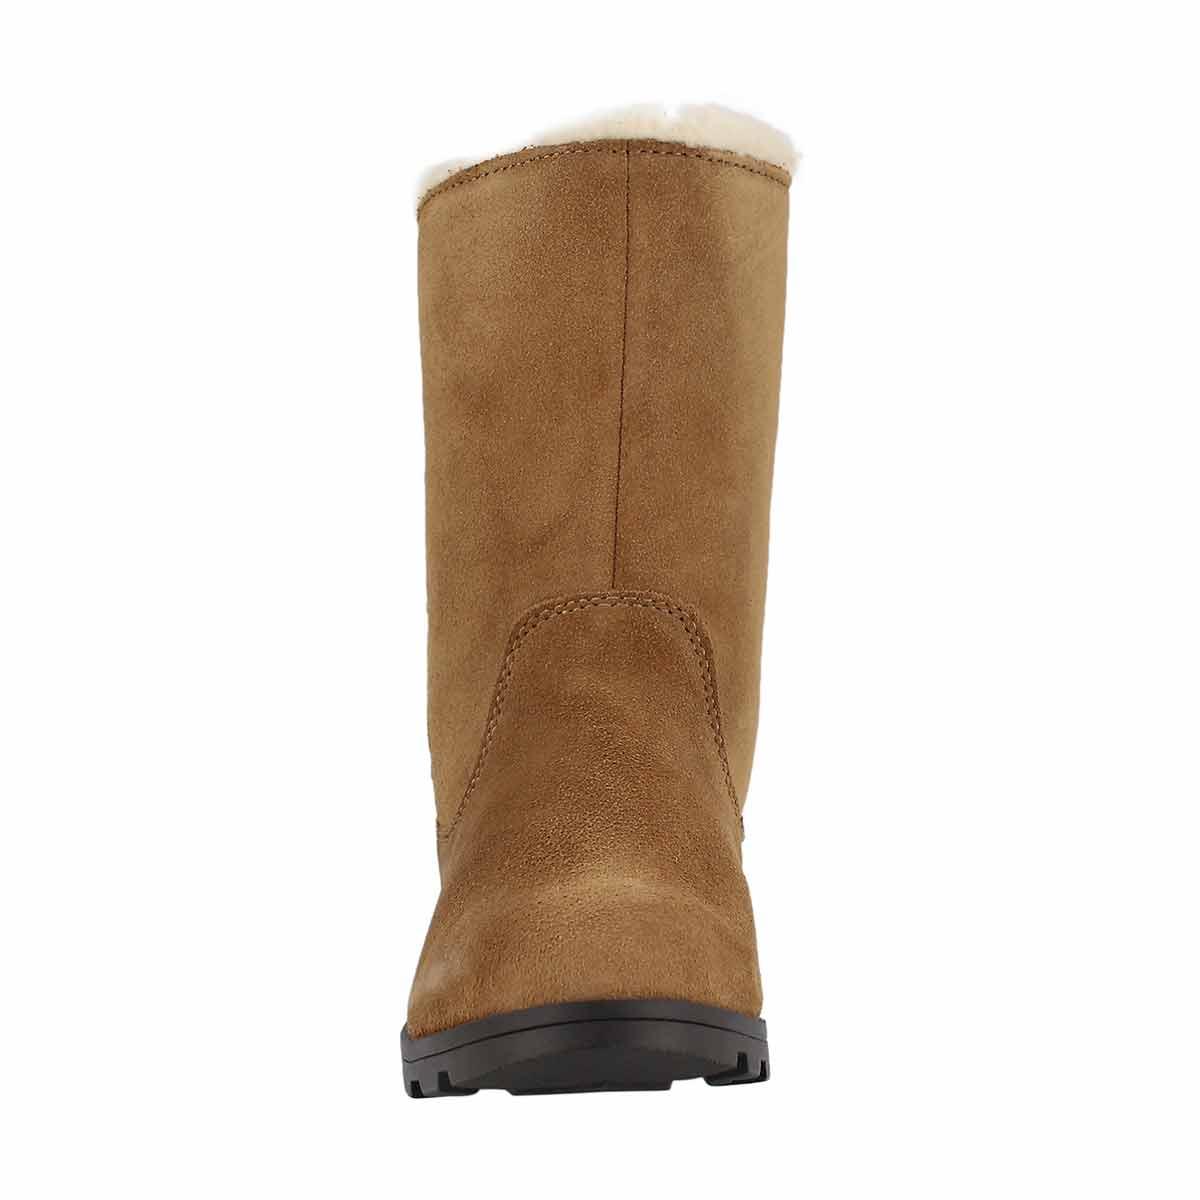 Grls Emelie Foldover cml brn casual boot